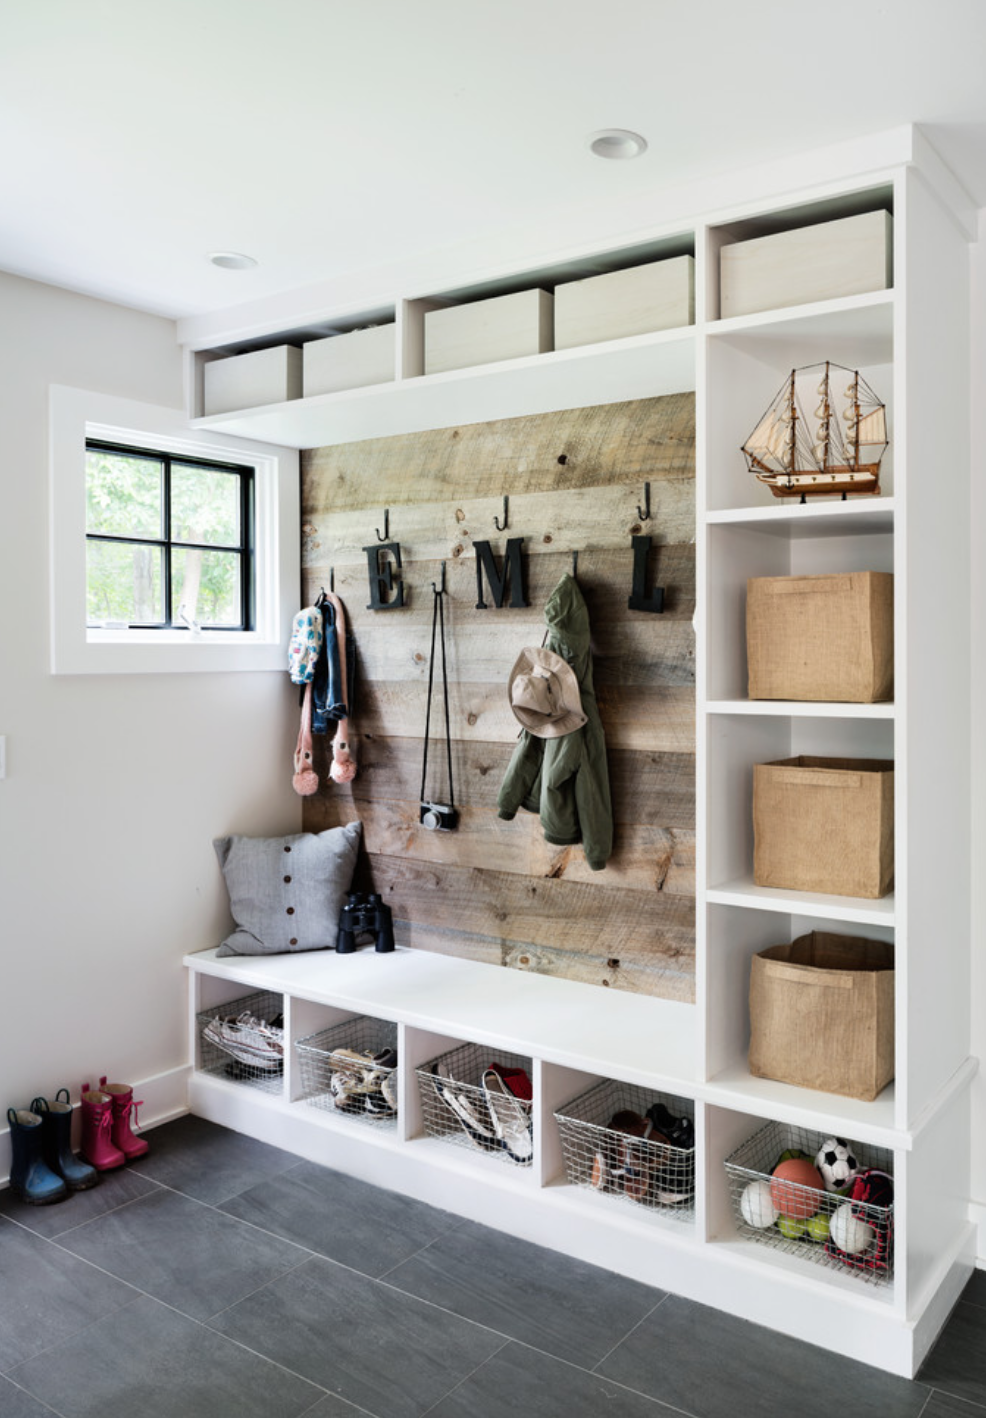 mud room storage concept   Inspiring interiors   Pinterest ...